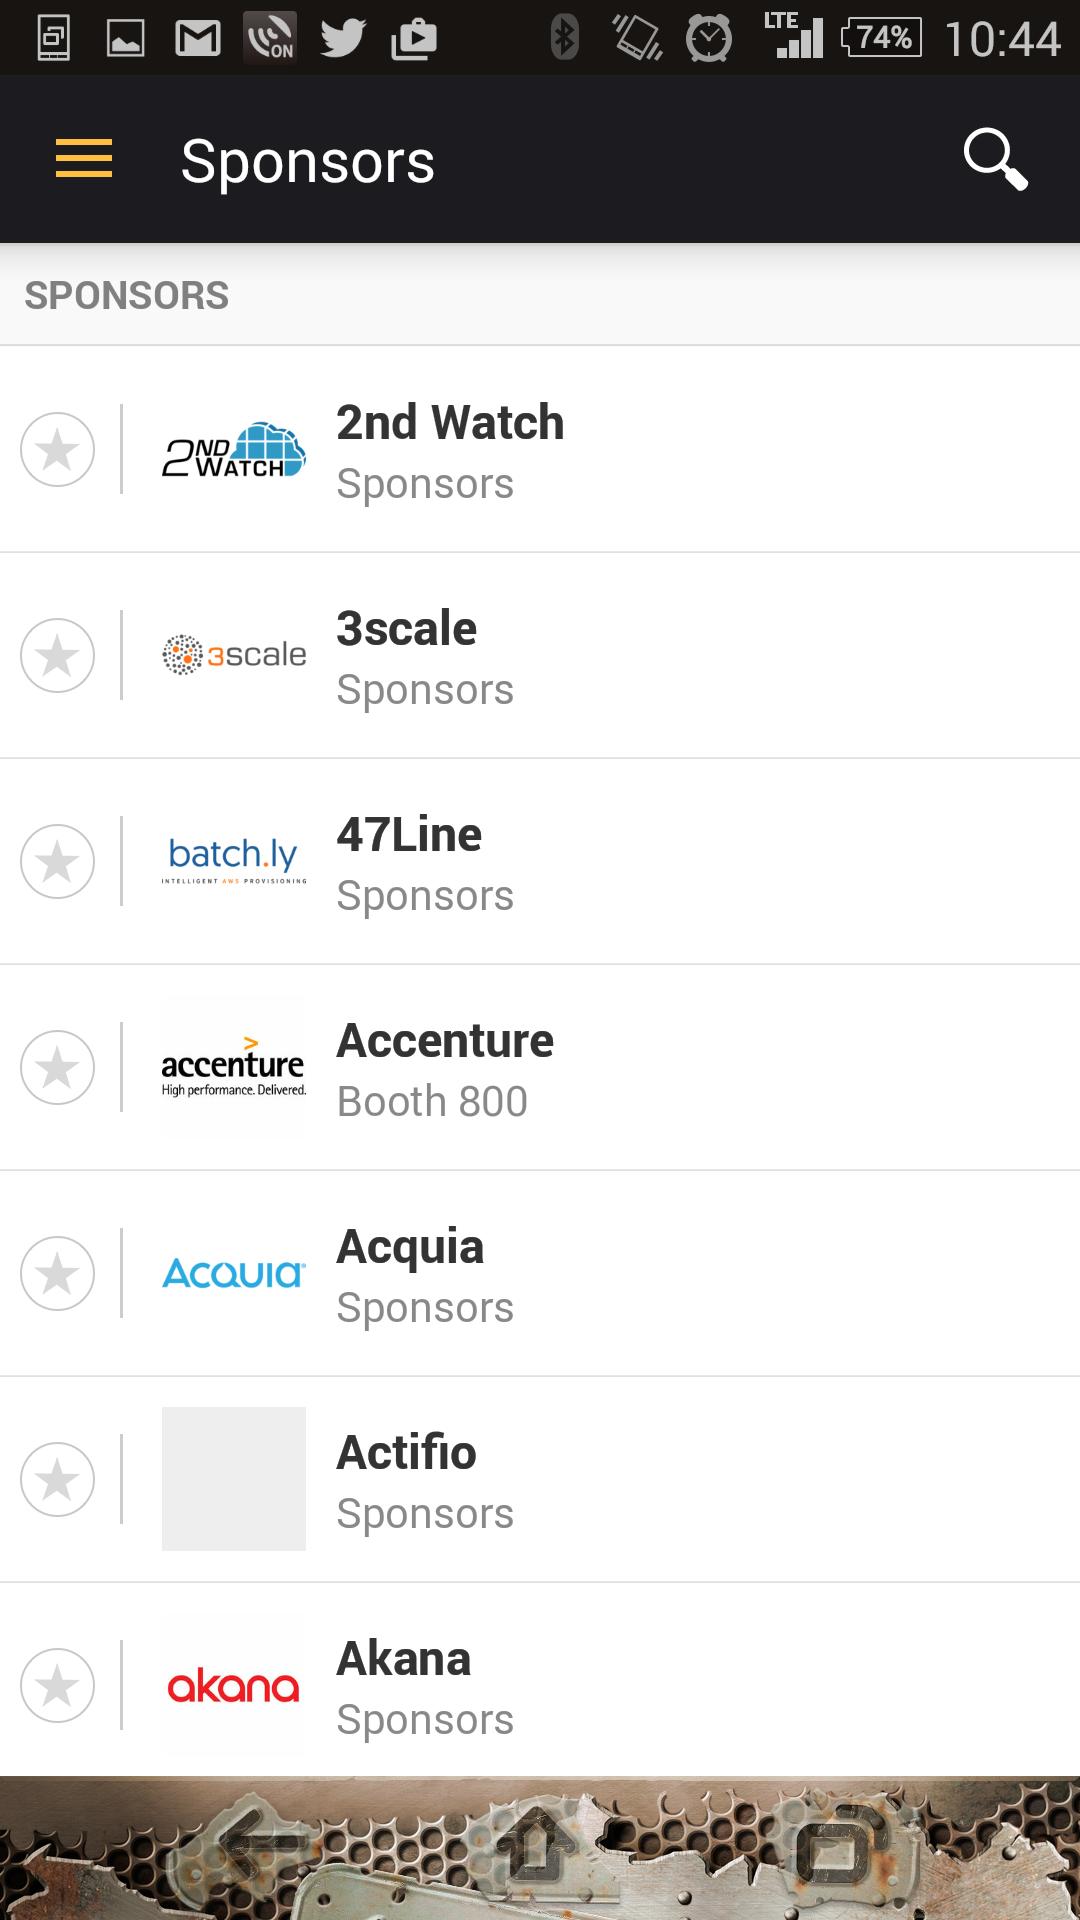 aws-reinvent-2015-event-app_17